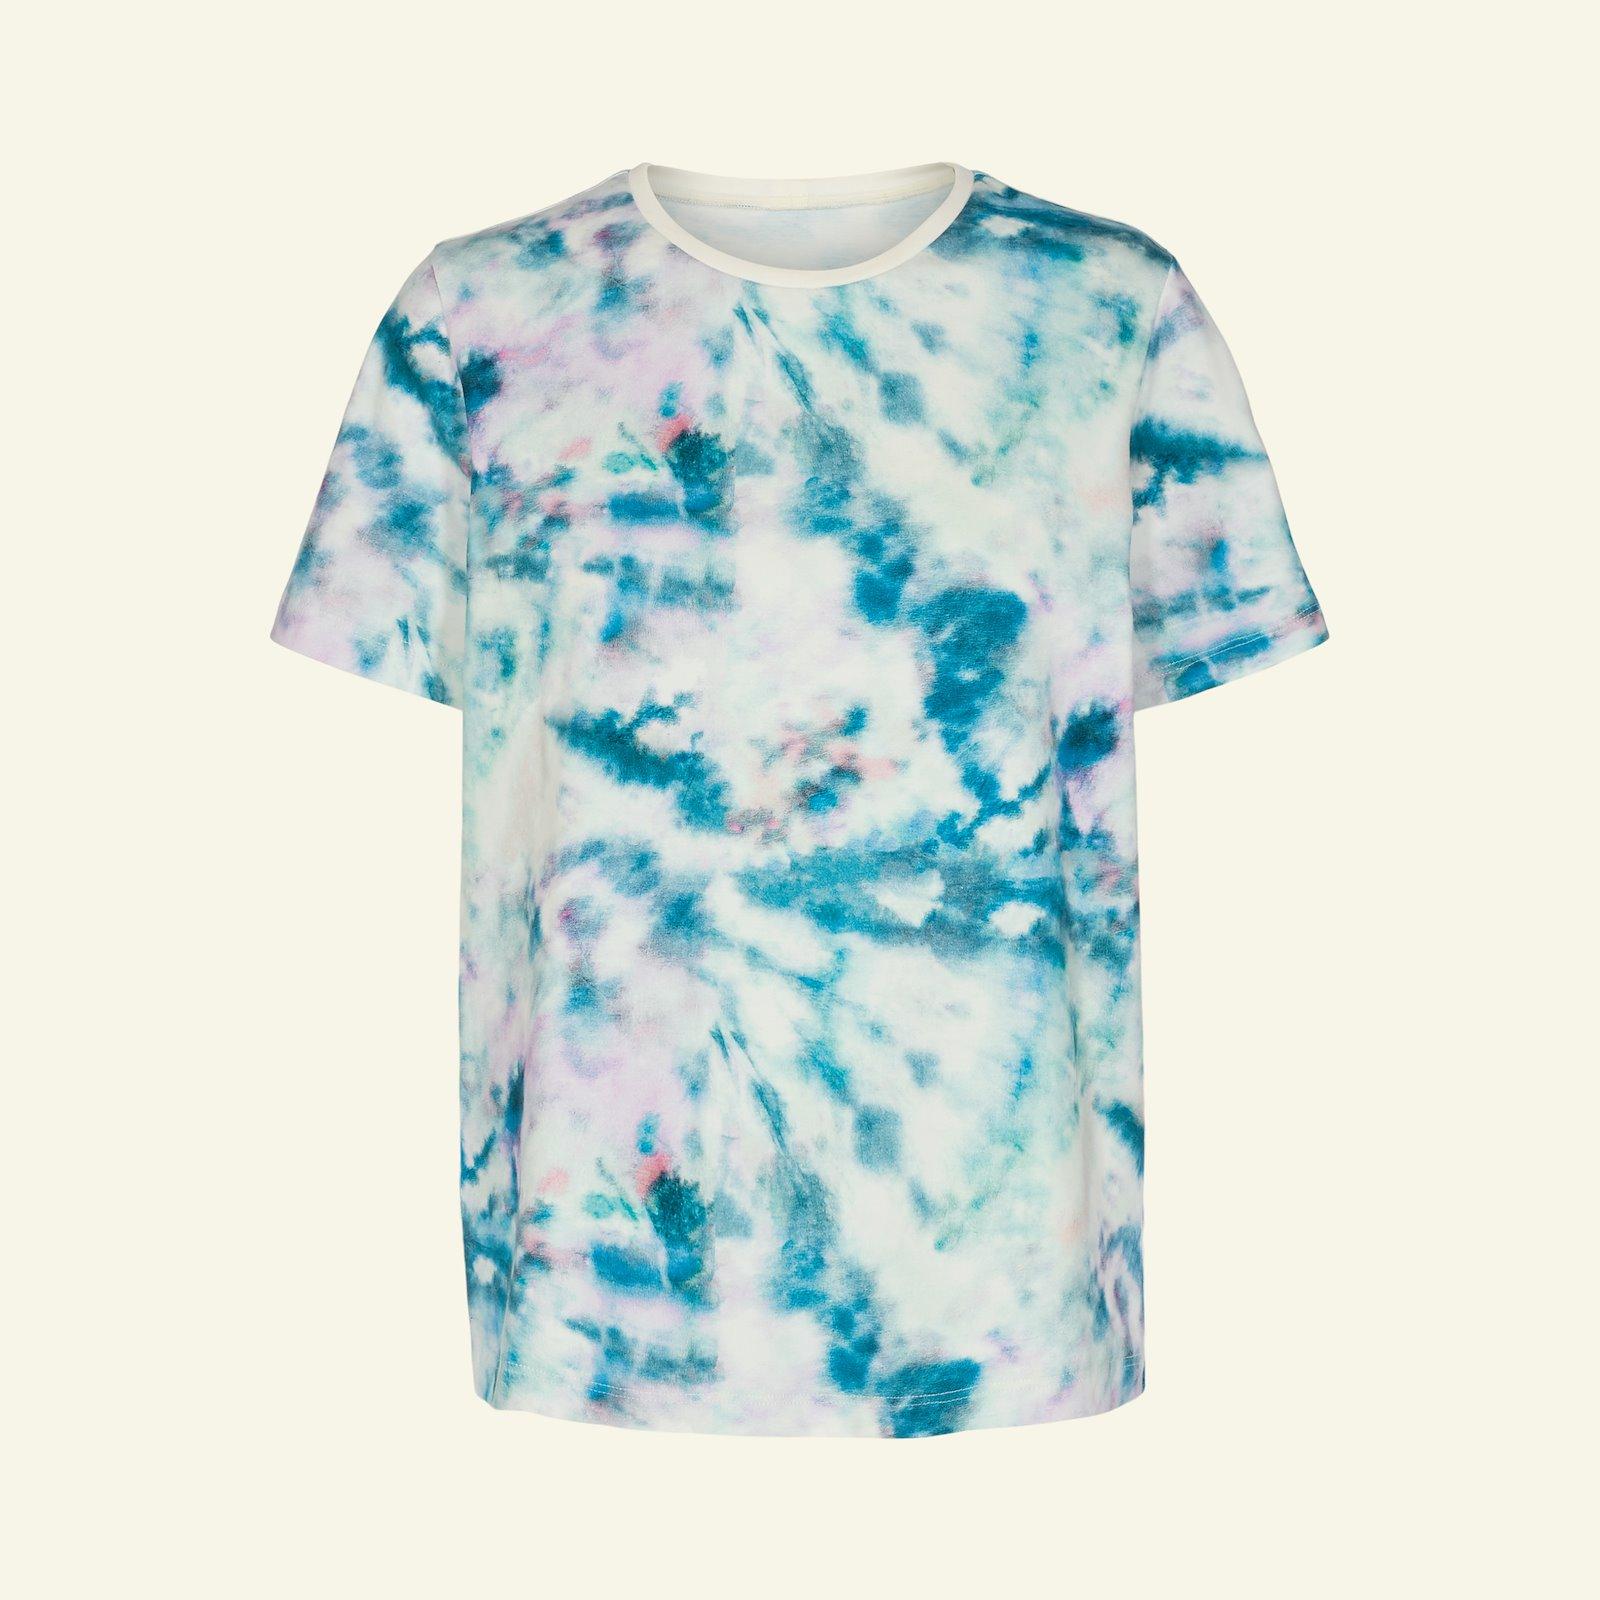 T-shirt and dress, 40/12 p22070_272729_sskit